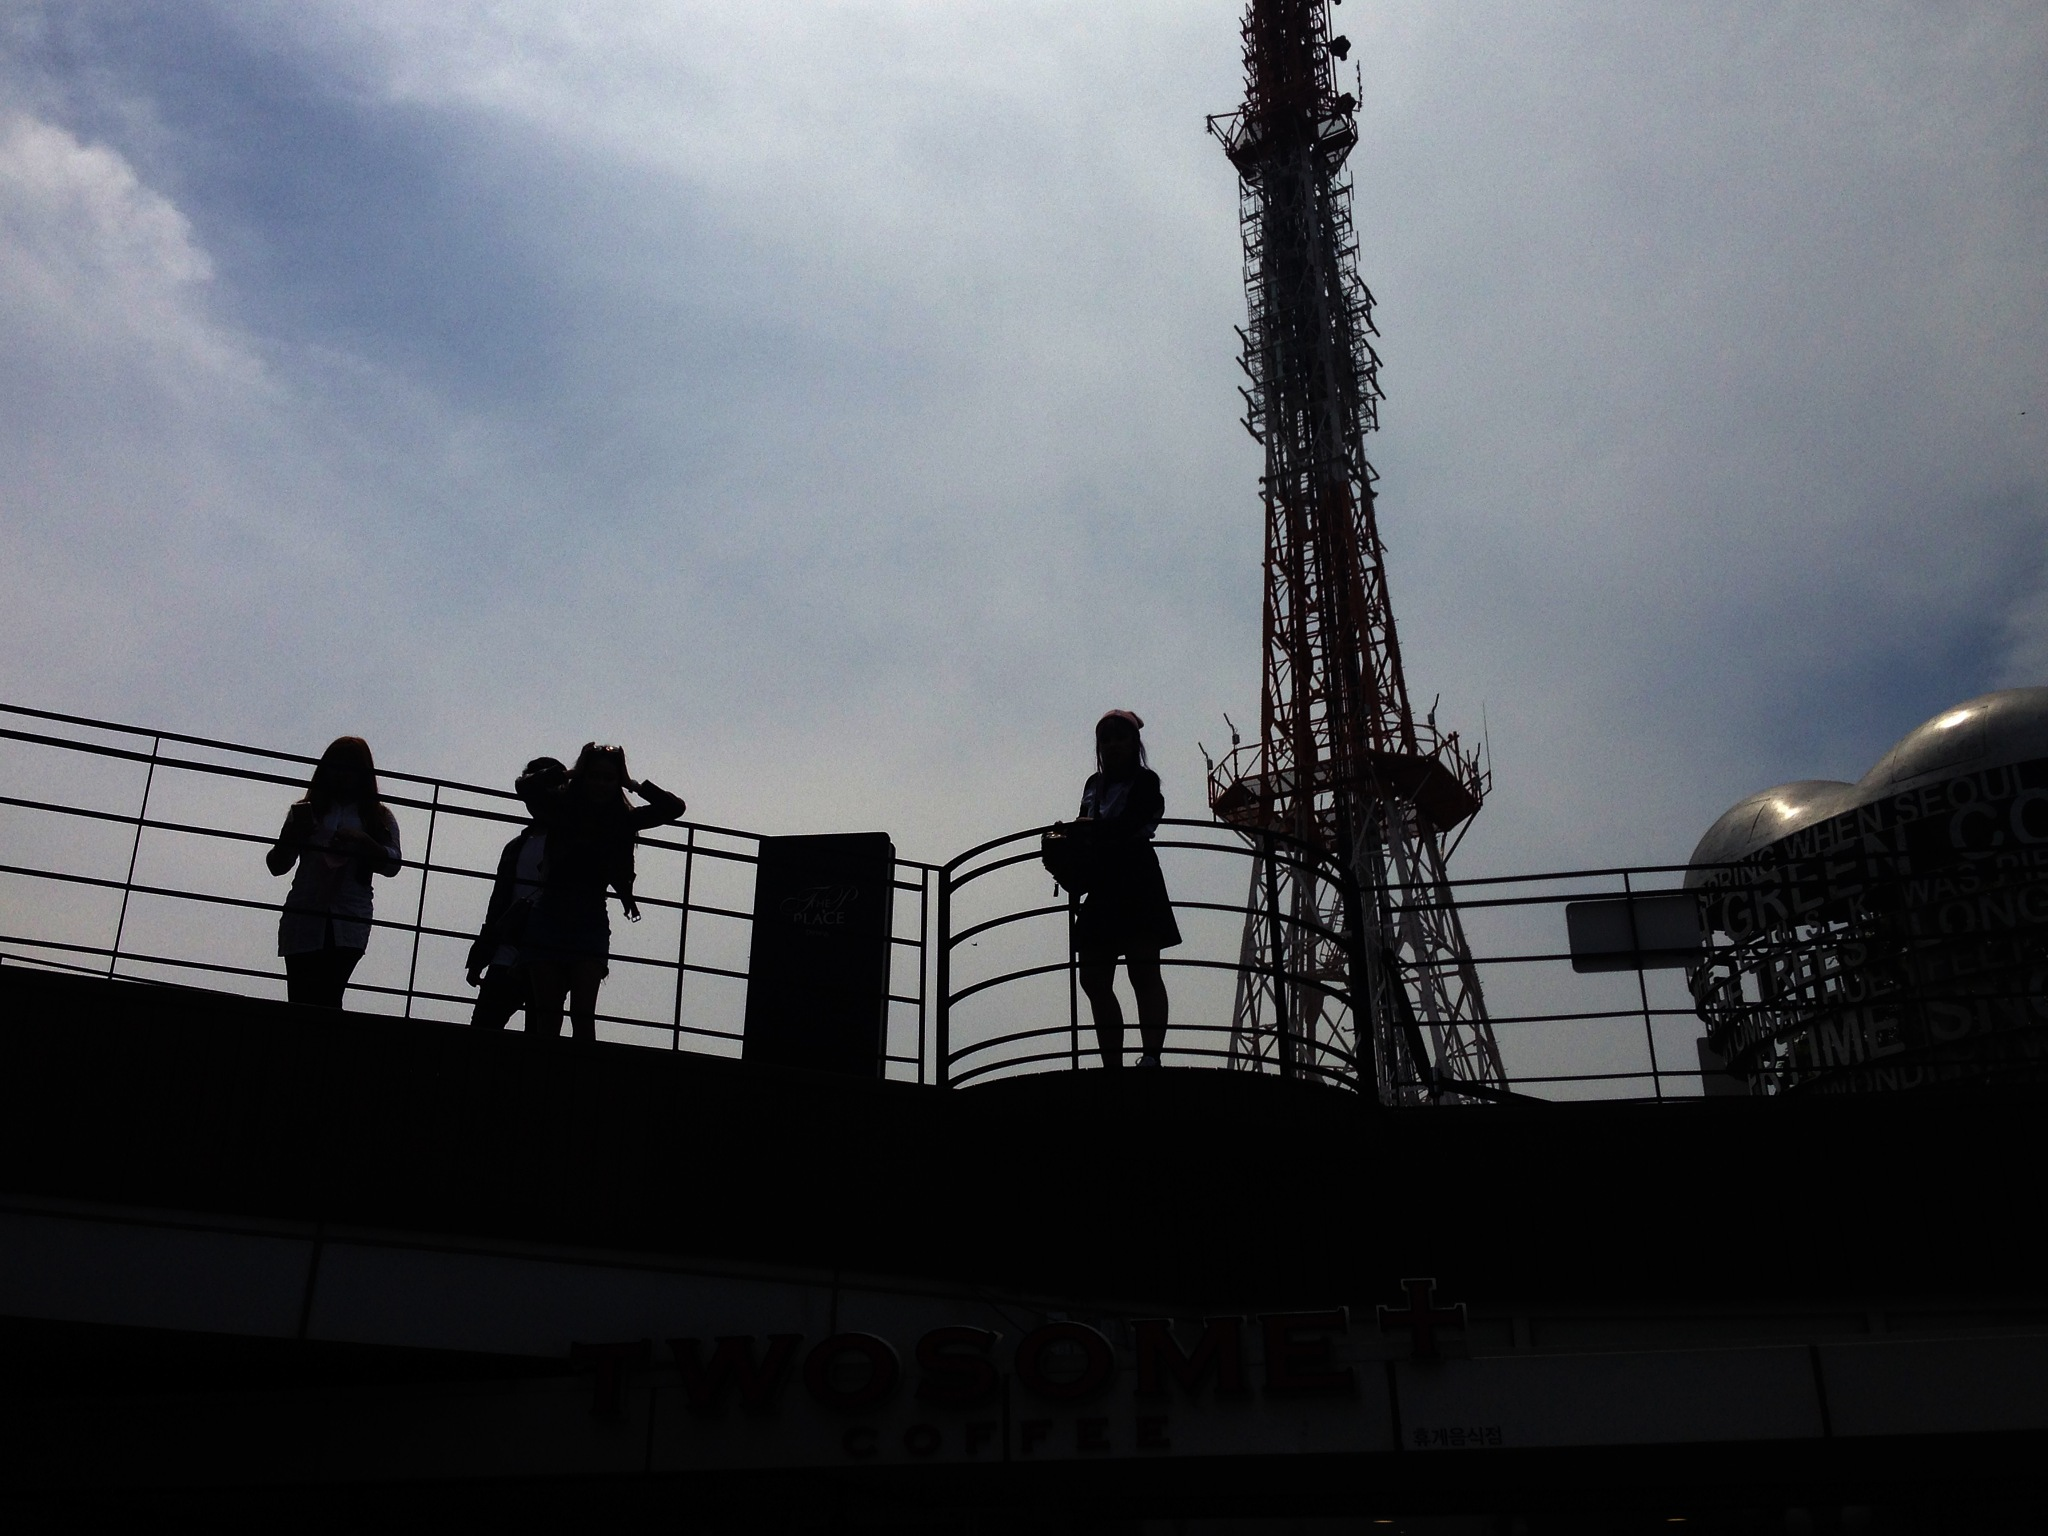 Namsan Tower Viewing Deck by rgalbarillo